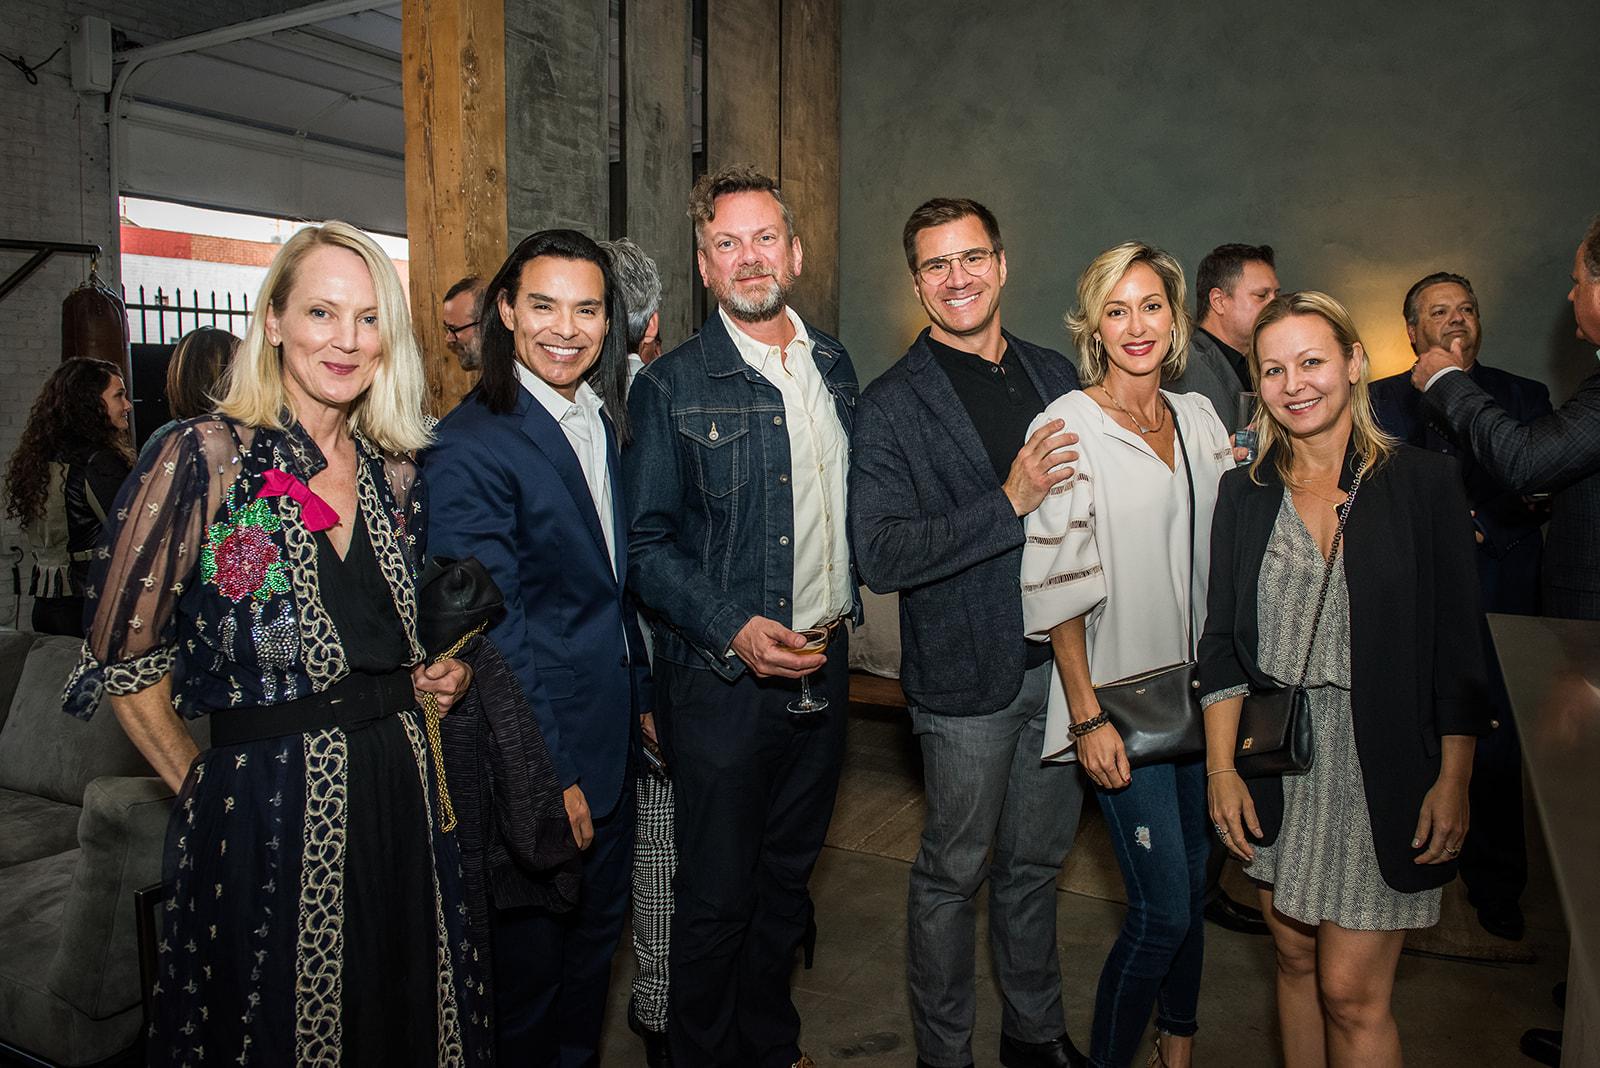 From left to right: Ames Ingram, Tony Estrada, Arthur Redman, Stephen Jones, Ginna Christensen and Wendy Haworth